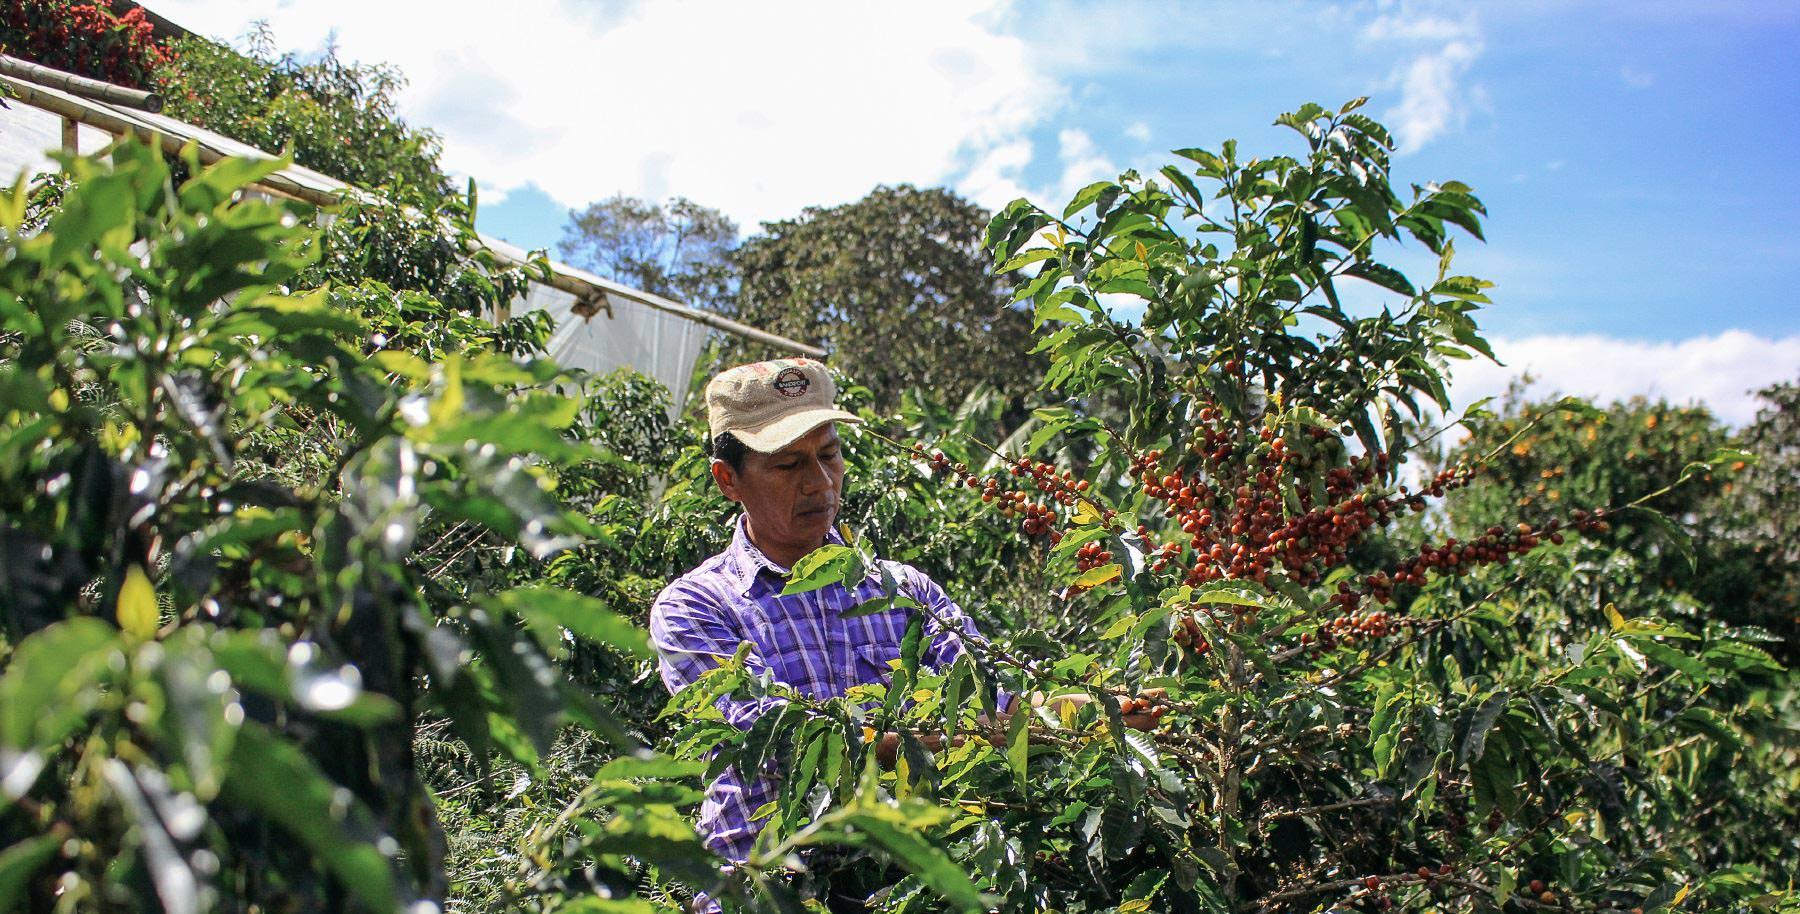 Luis Alberto picking coffee cherries